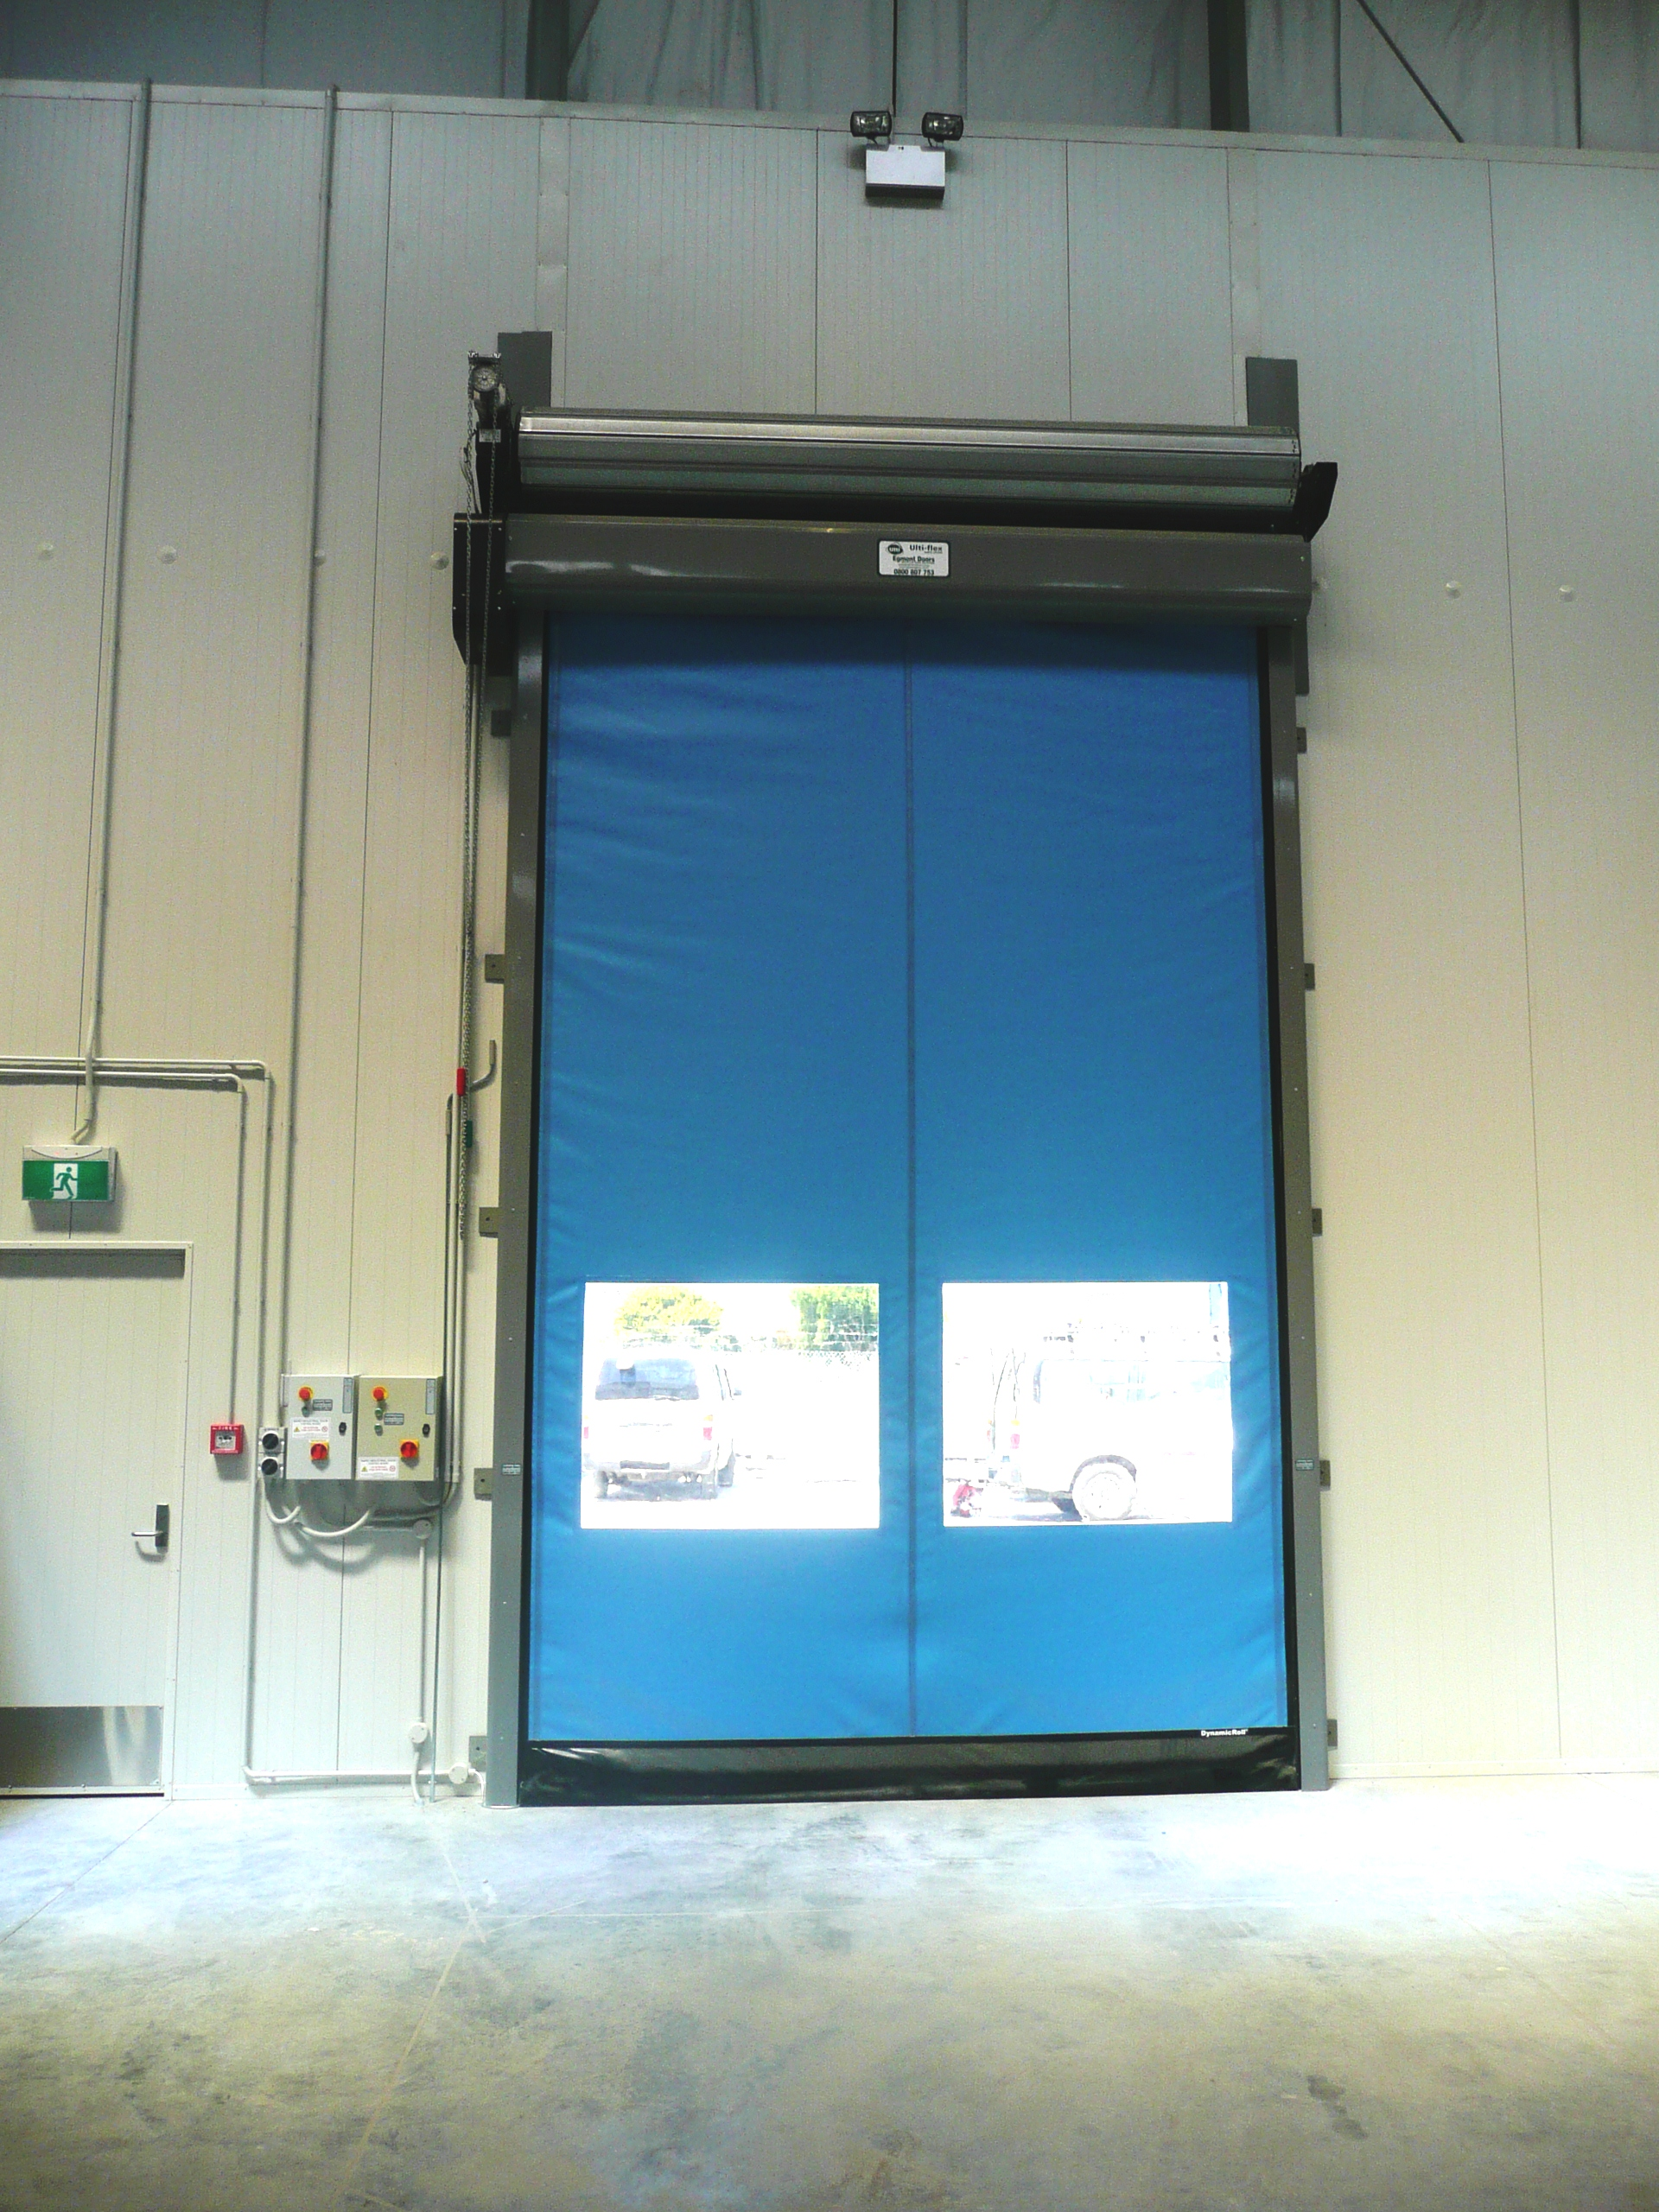 Thermichroll and Ulti Roll Komby Doors - Bidvest Whakatu (6)